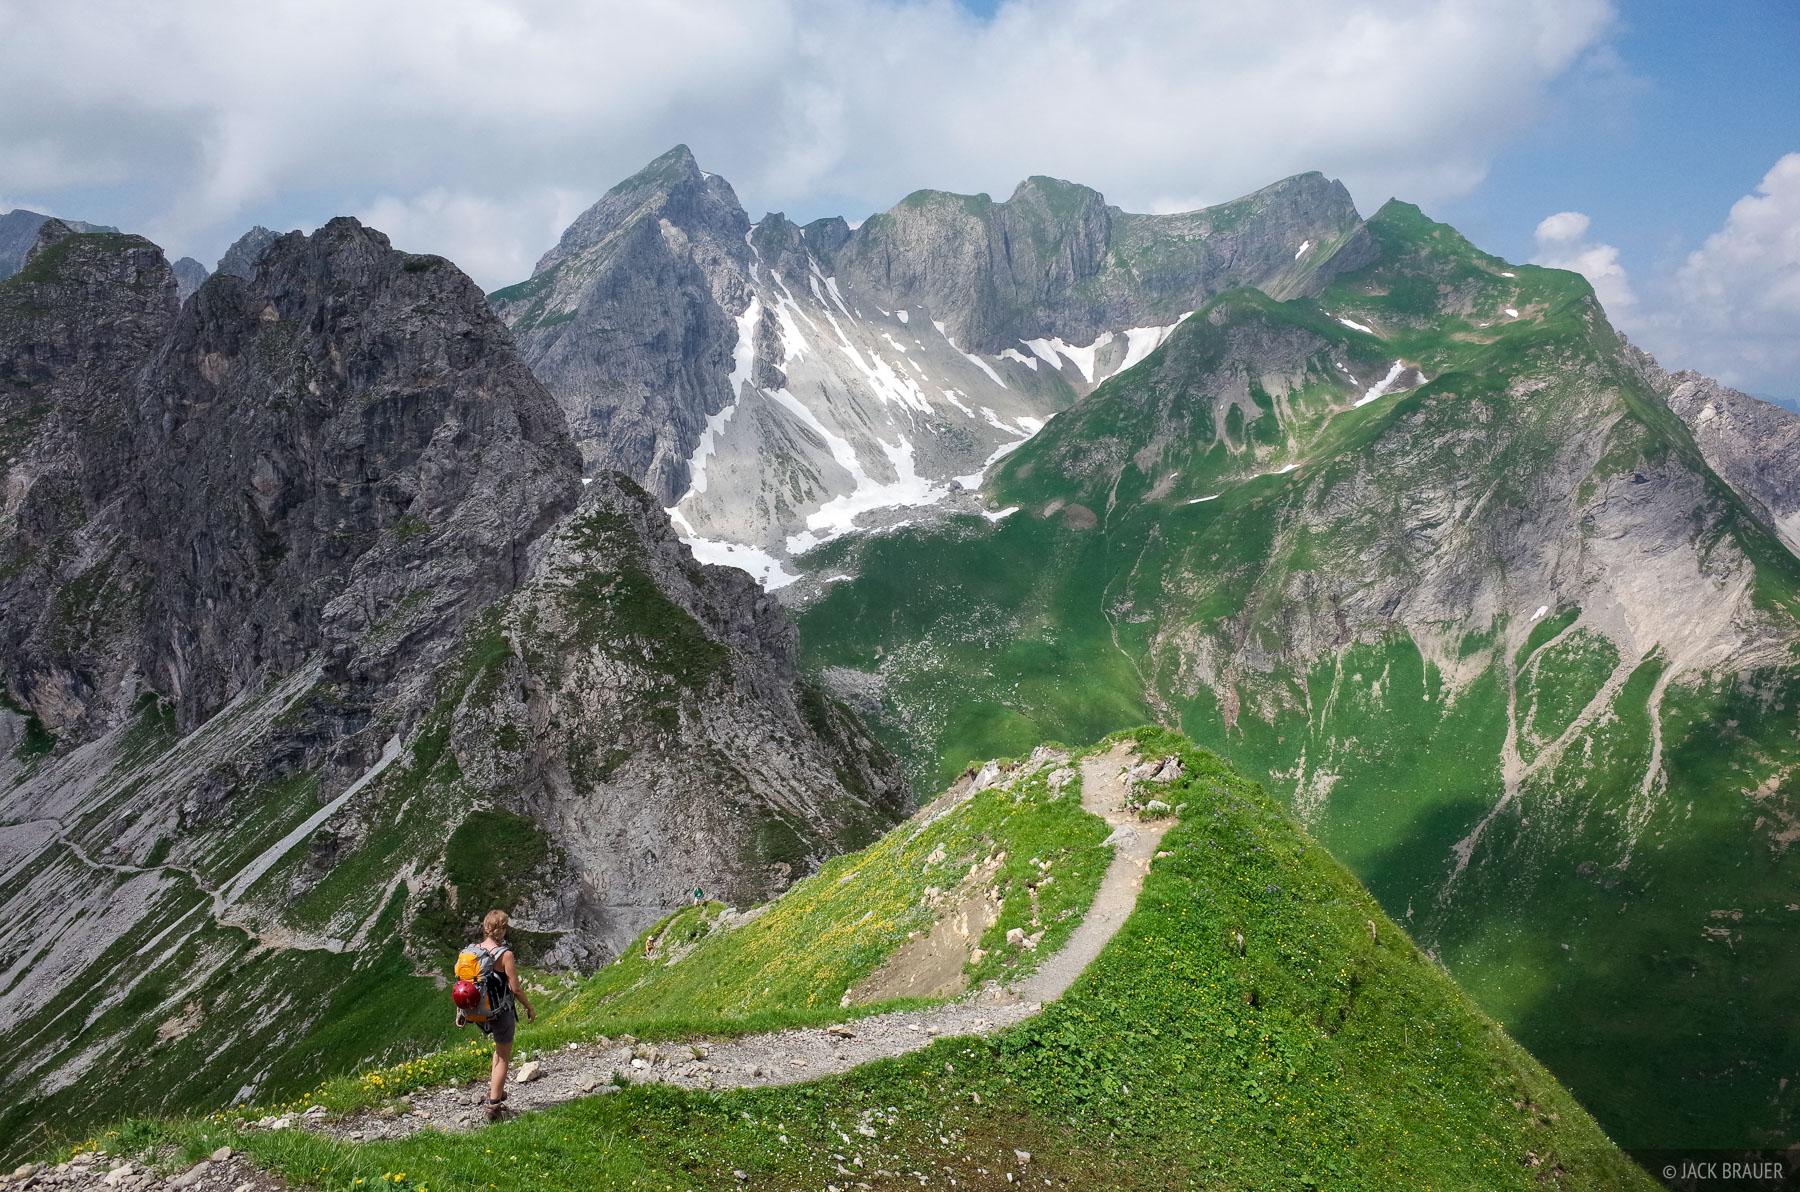 Allgäuer Alps, Germany, Mindelheimer, Klettersteig, Alps, photo